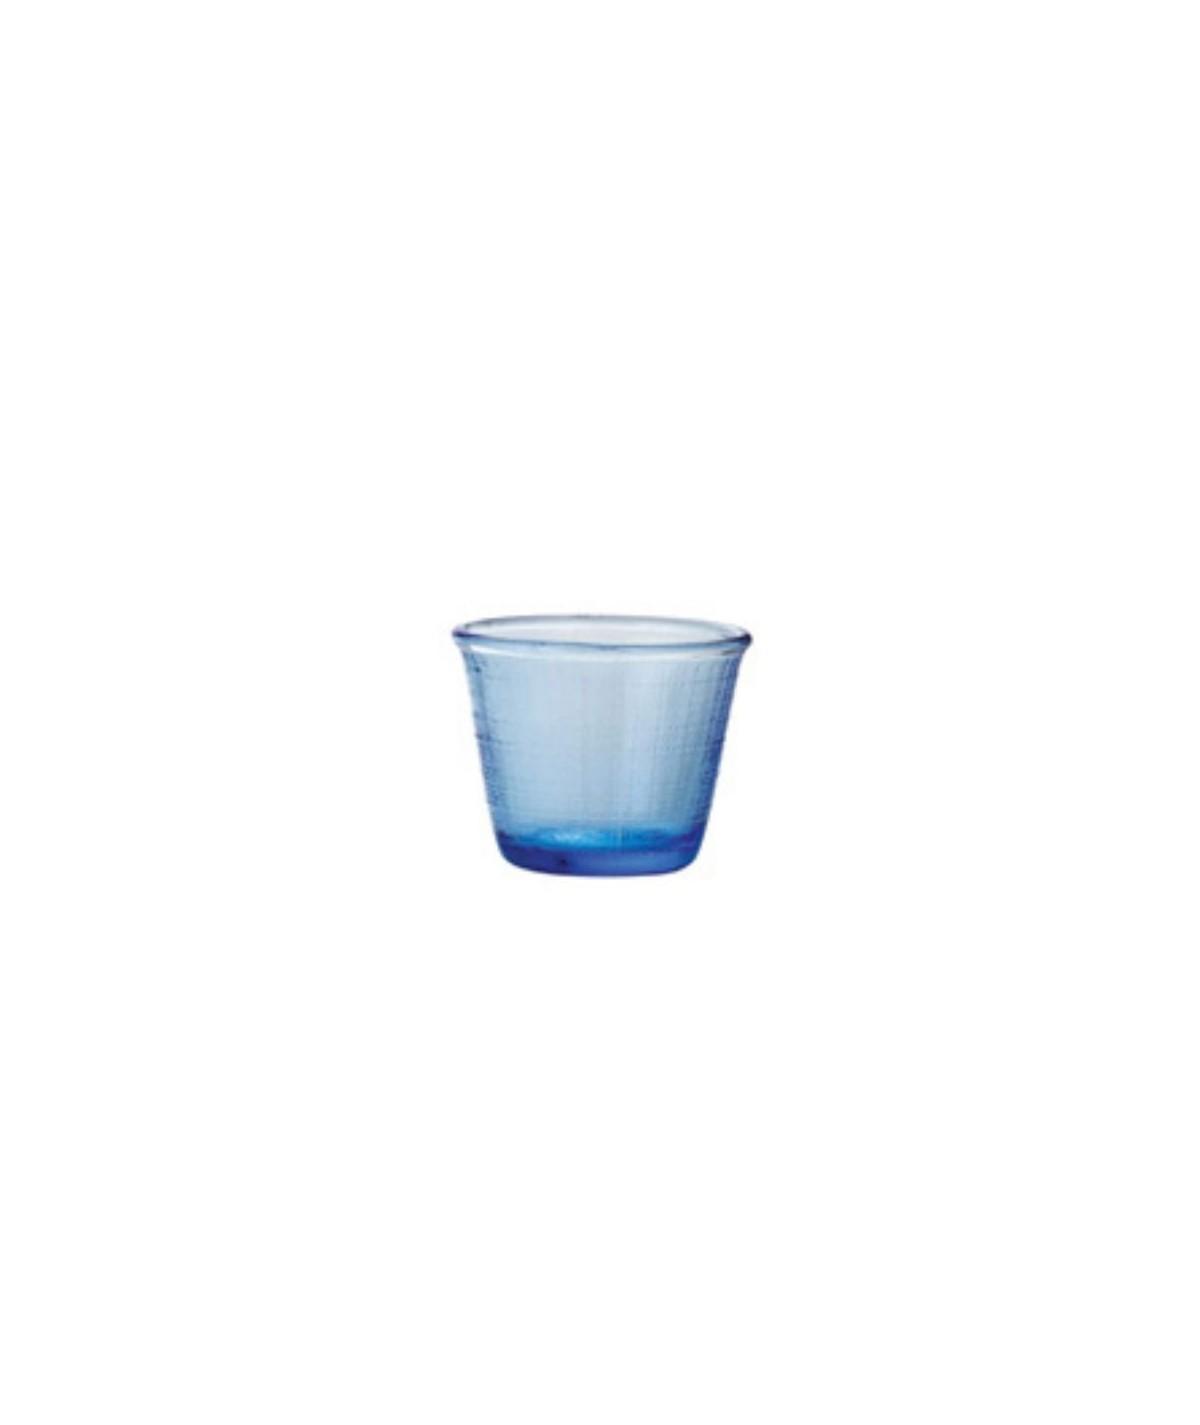 Bicchiere blu in vetro Denim set 6 pezzi - Every Day